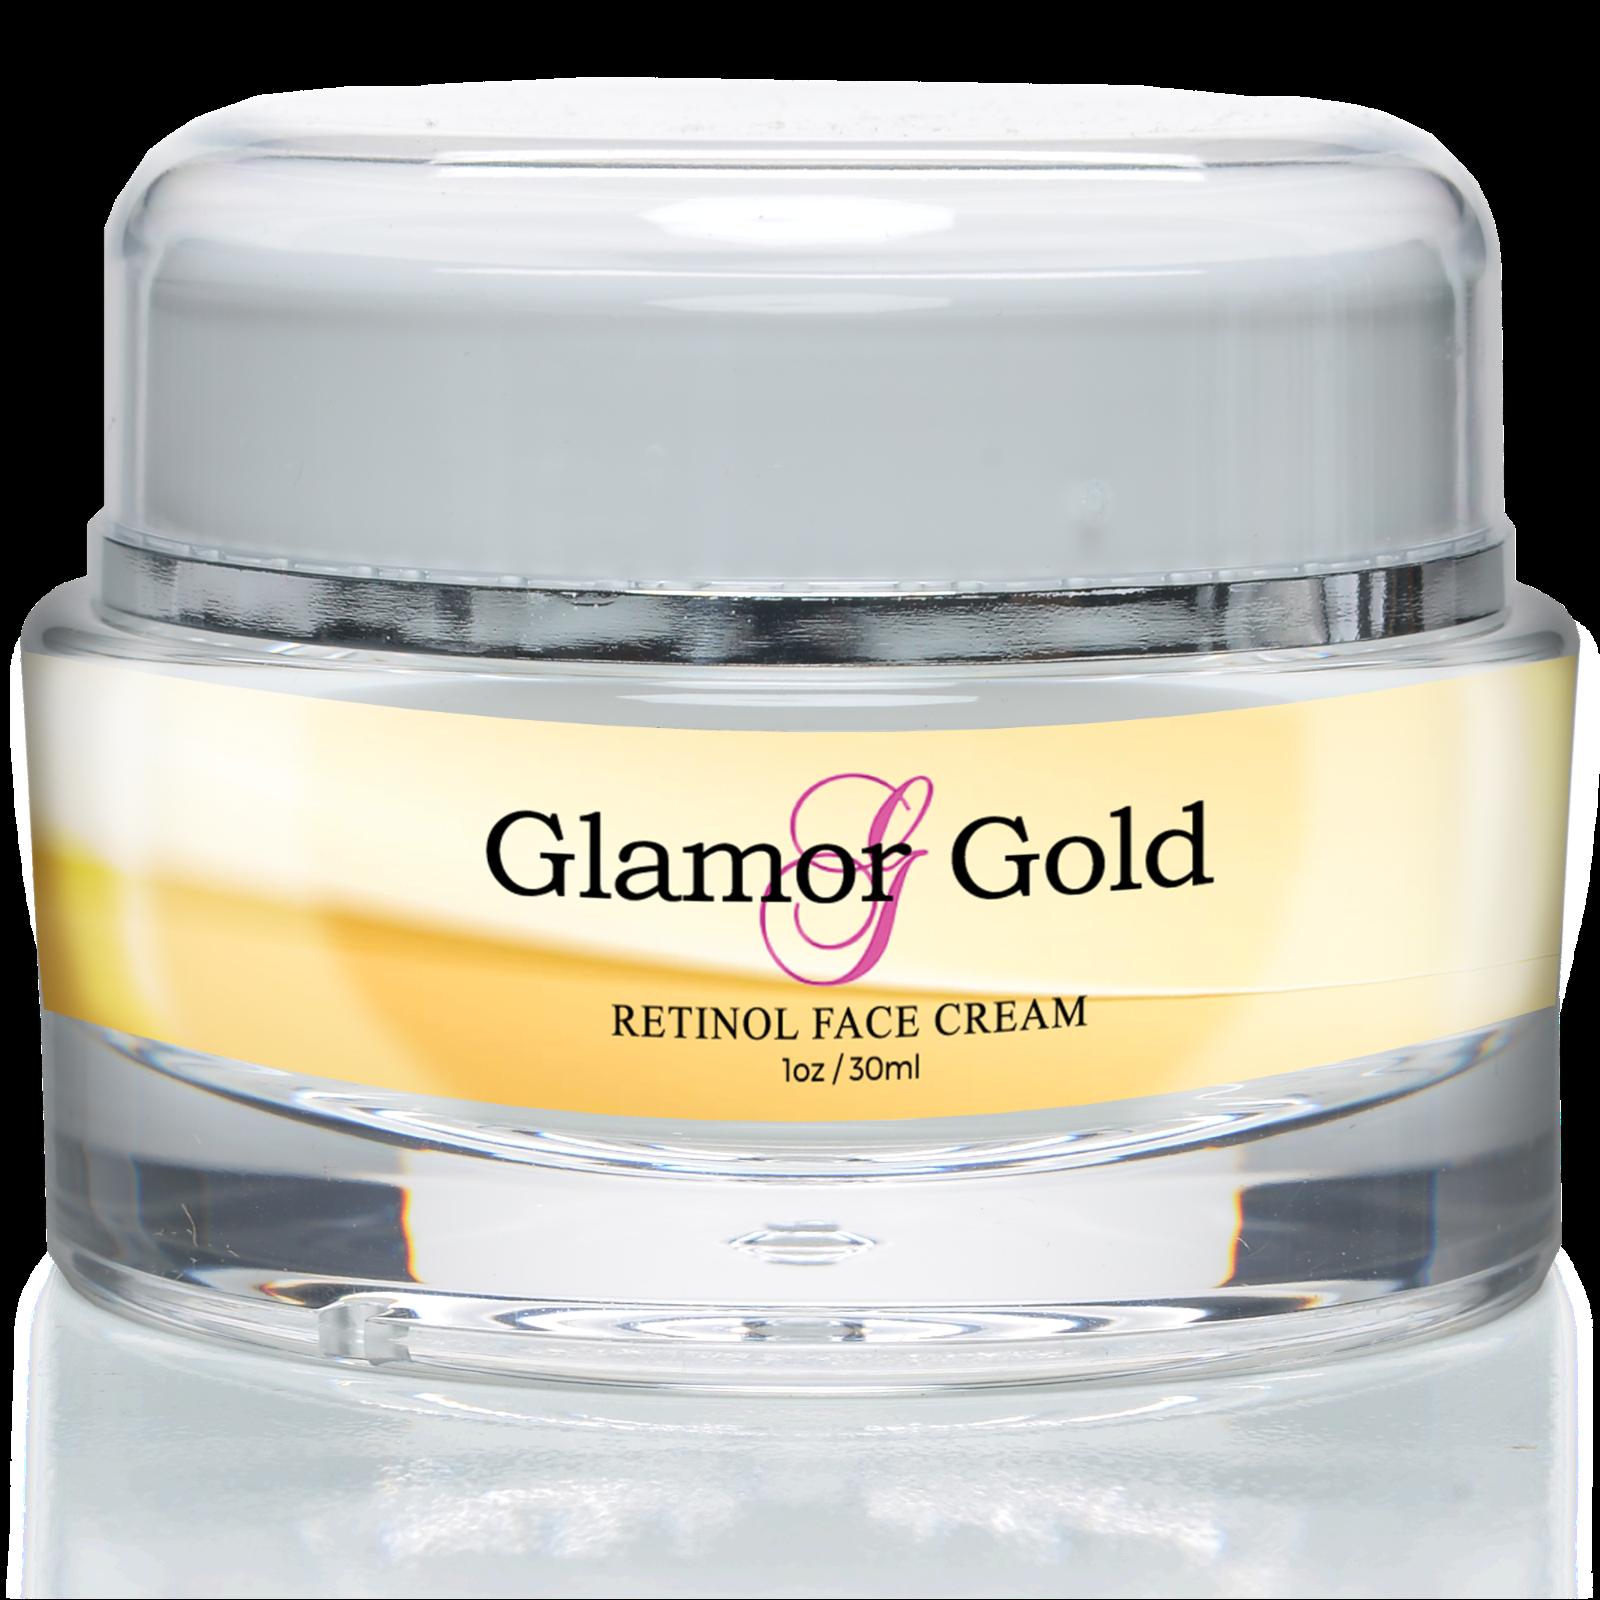 Glamor Gold Retinol Face Cream - Anti Aging Day/Night Cream